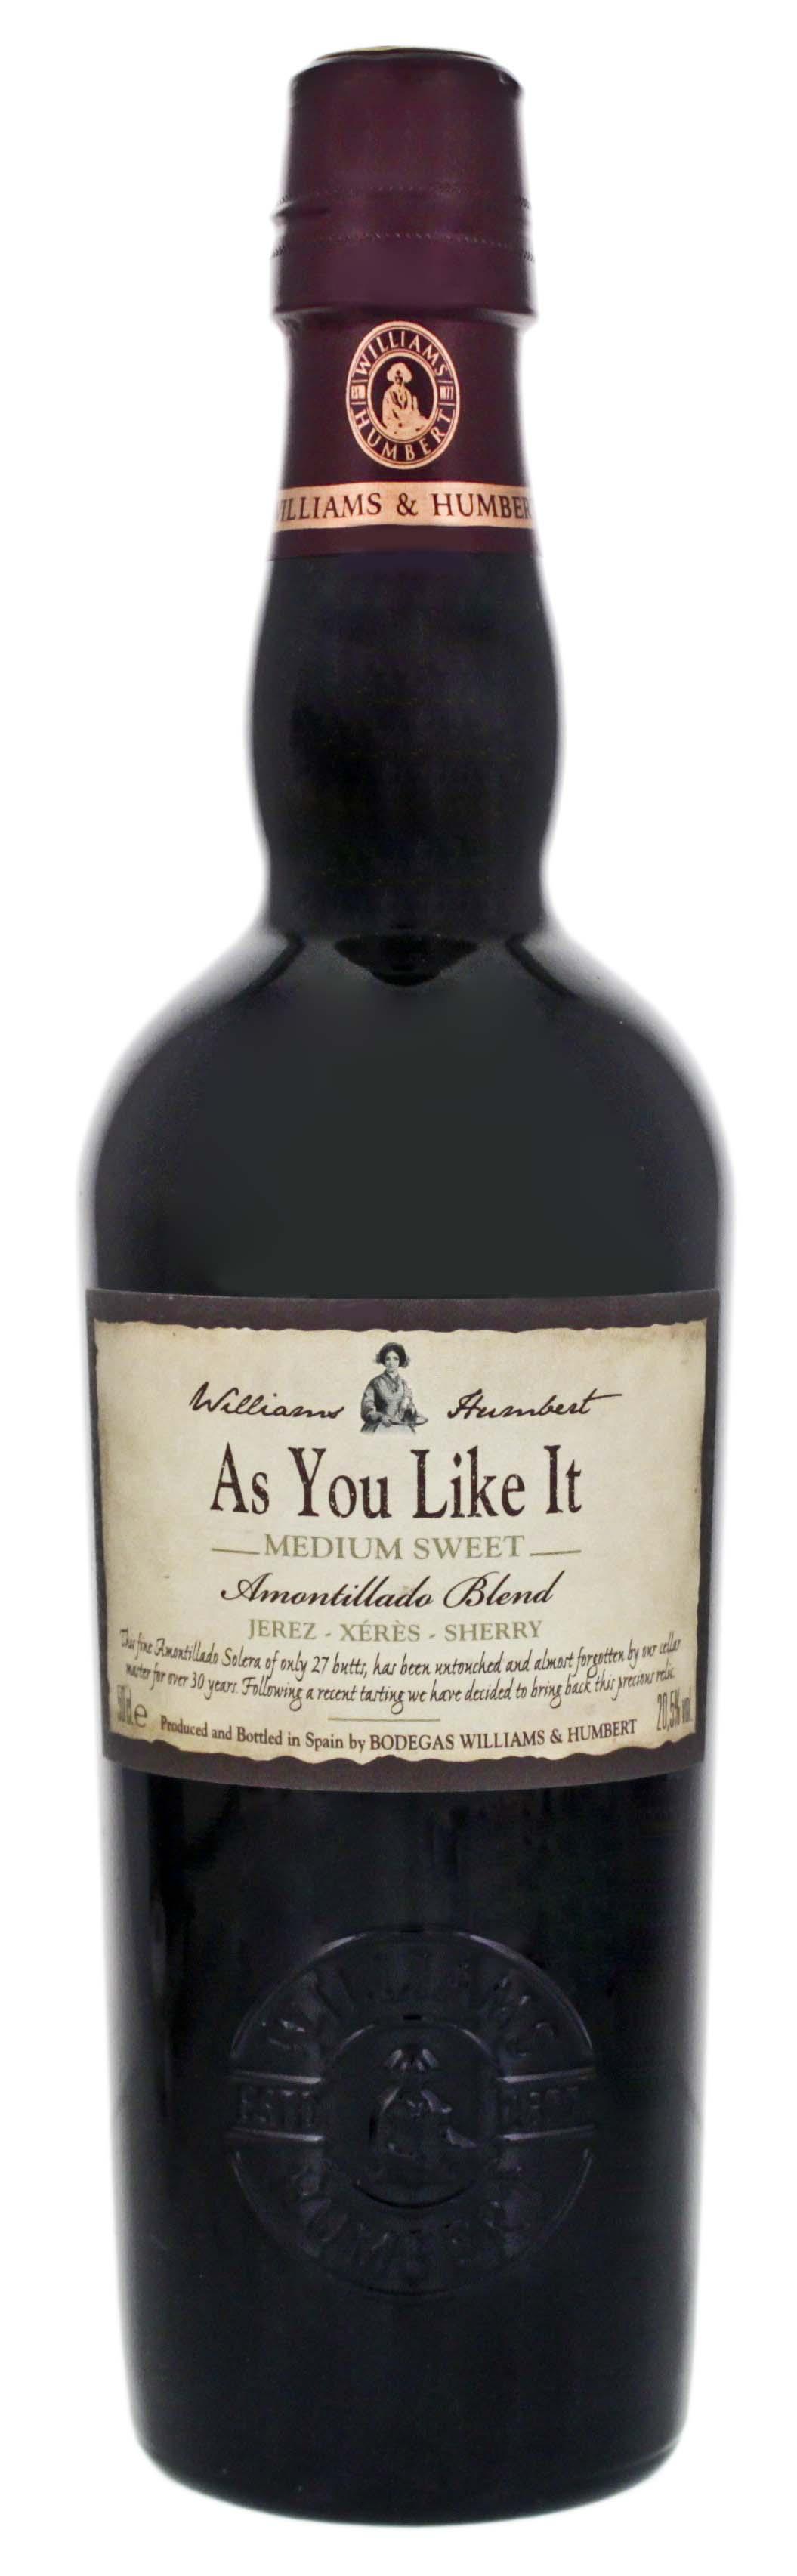 Williams & Humbert As You Like It Medium Sweet Sherry 0,5L